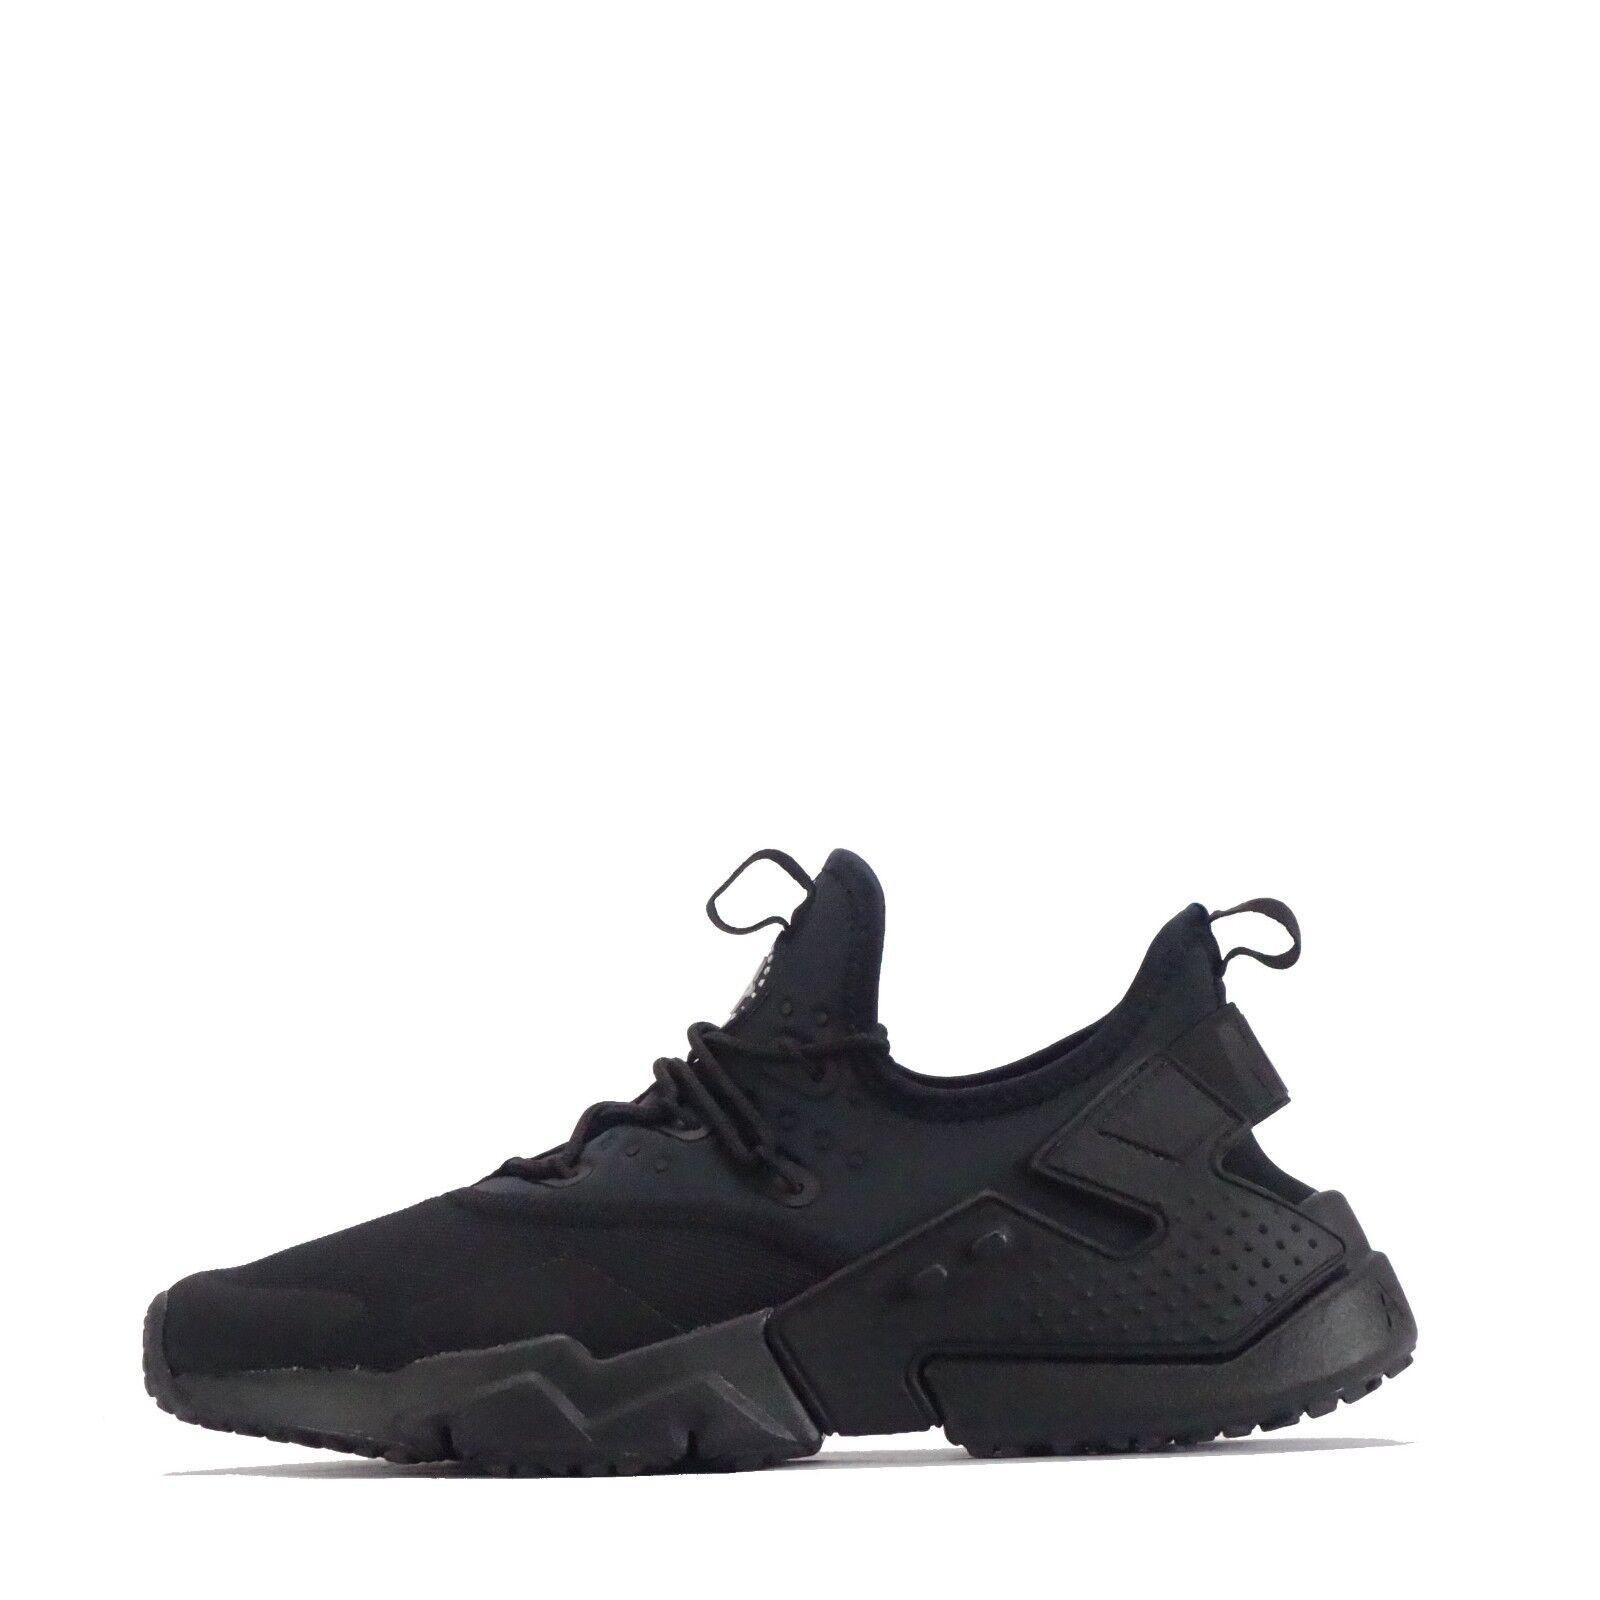 Nike Air hurache DRIFT scarpe da ginnastica Uomo in Nero Bianco